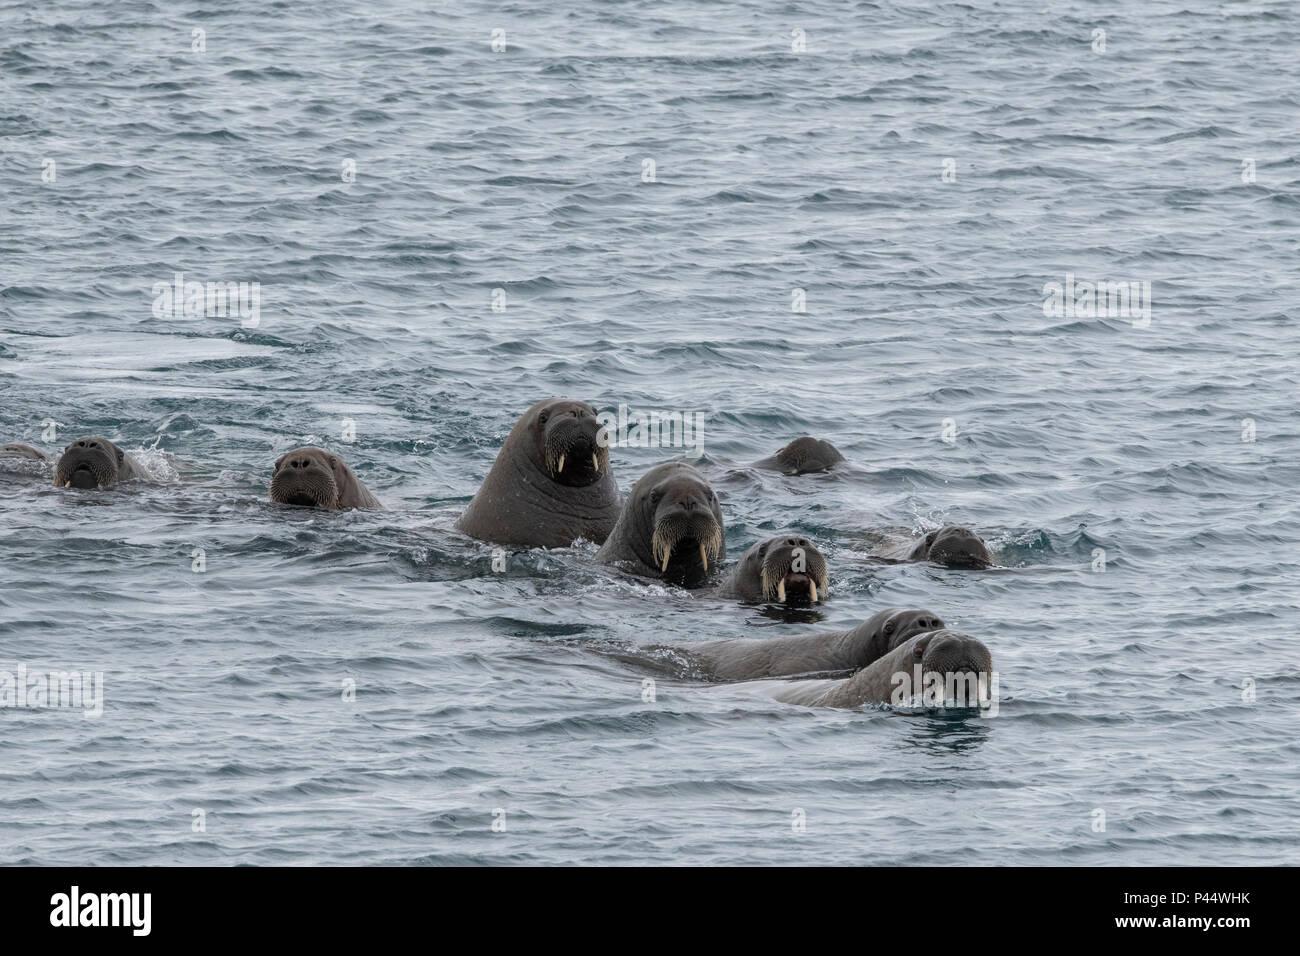 Norway, Svalbard, Nordaustlandet, Austfonna. Walrus (Odobenus rosmarus) swimming near icecap. Stock Photo